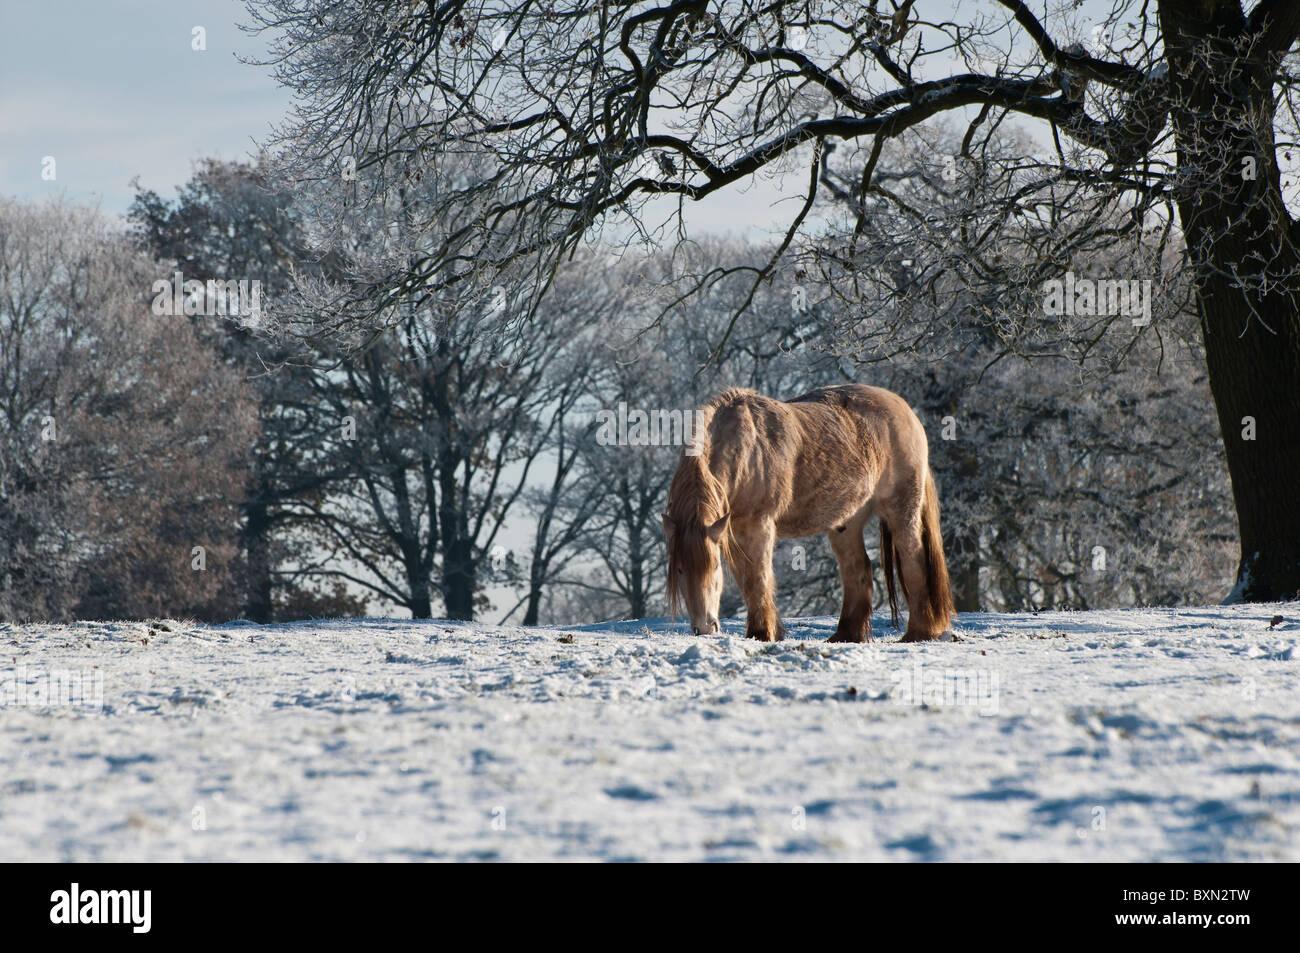 Braving the sub zero temperatures, Horse at Three Mile Lane, Keele, Staffordshire - Stock Image